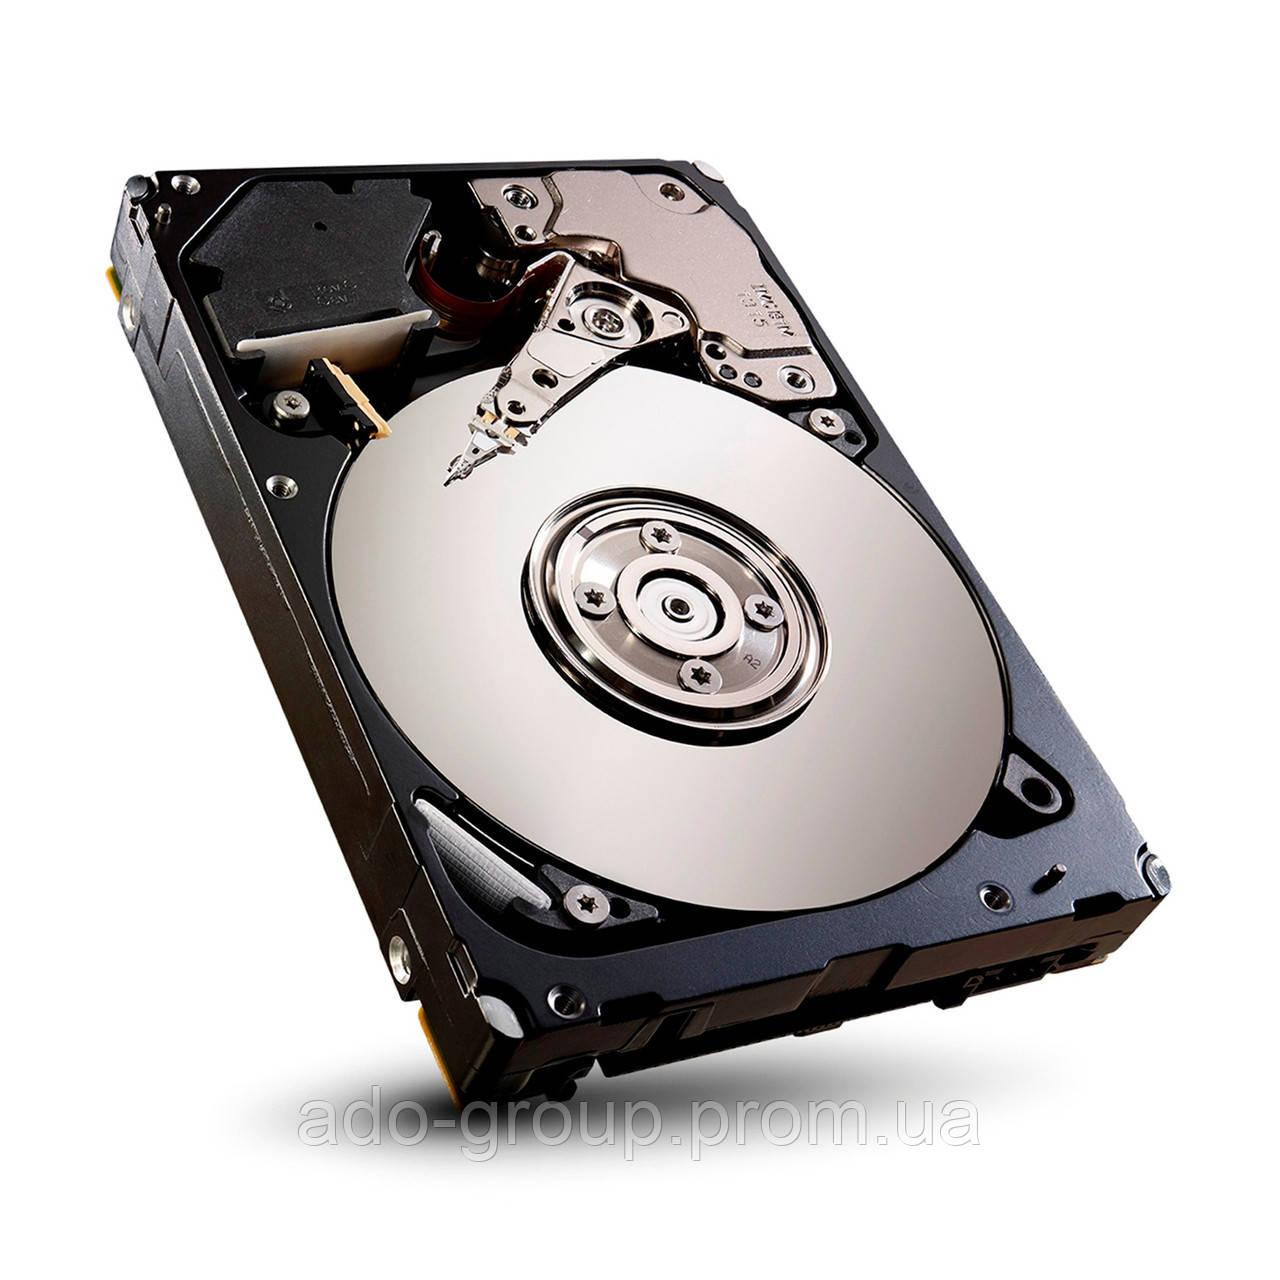 "360205-007 Жесткий диск HP 36.4GB SCSI 10K U320 3.5"" +"